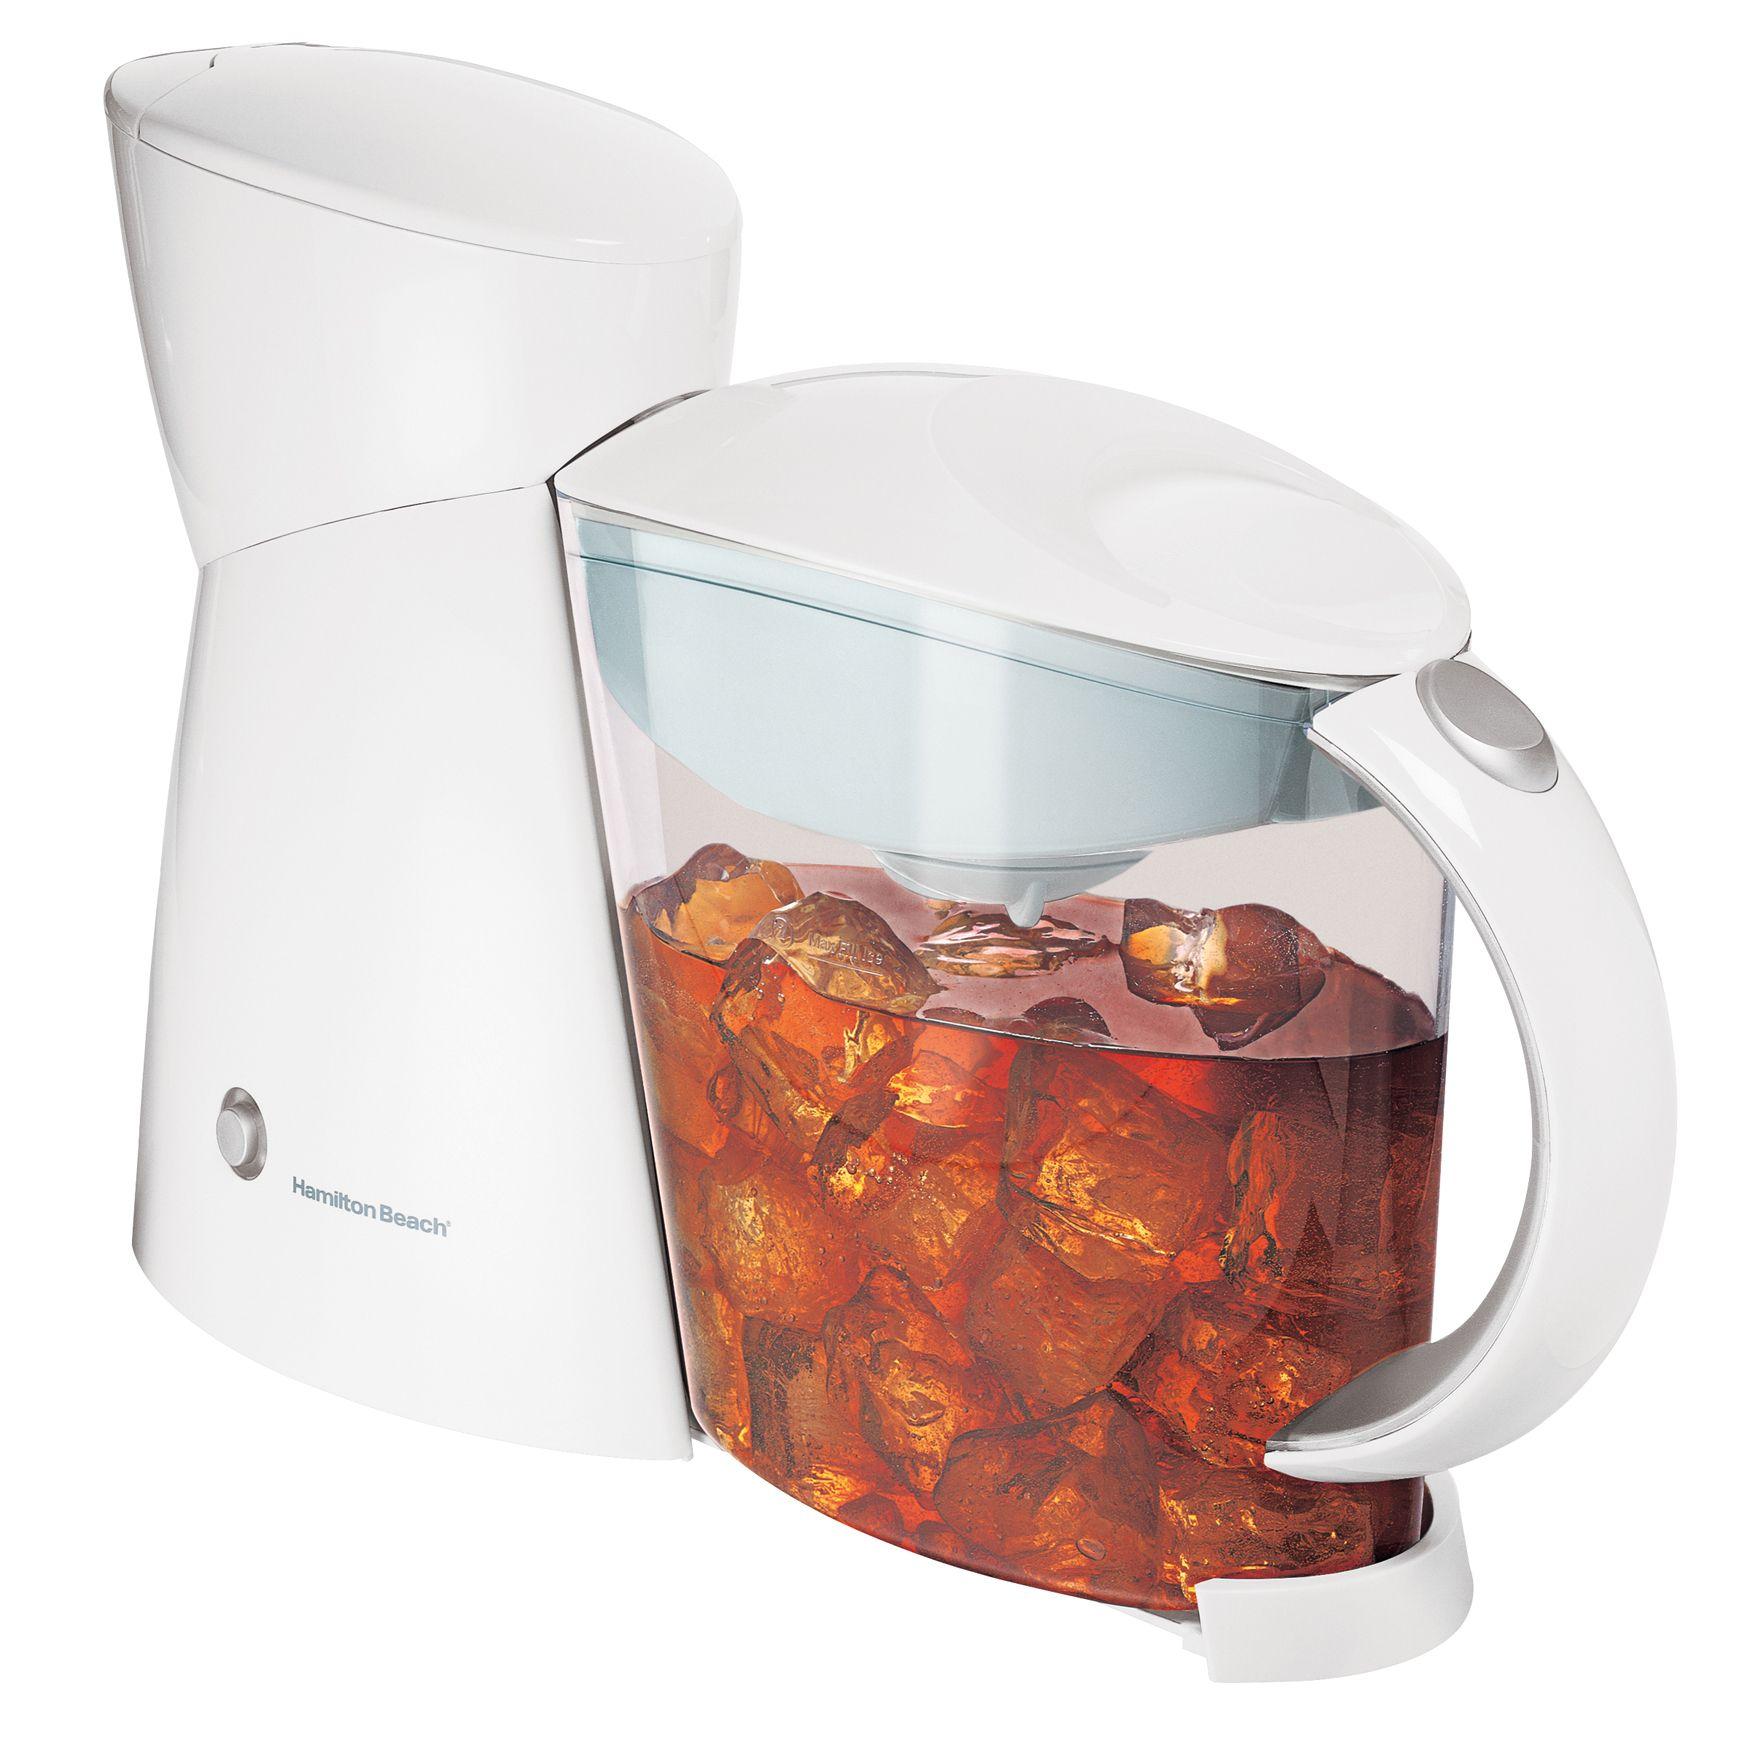 Iced Tea Maker -- Brylane Home